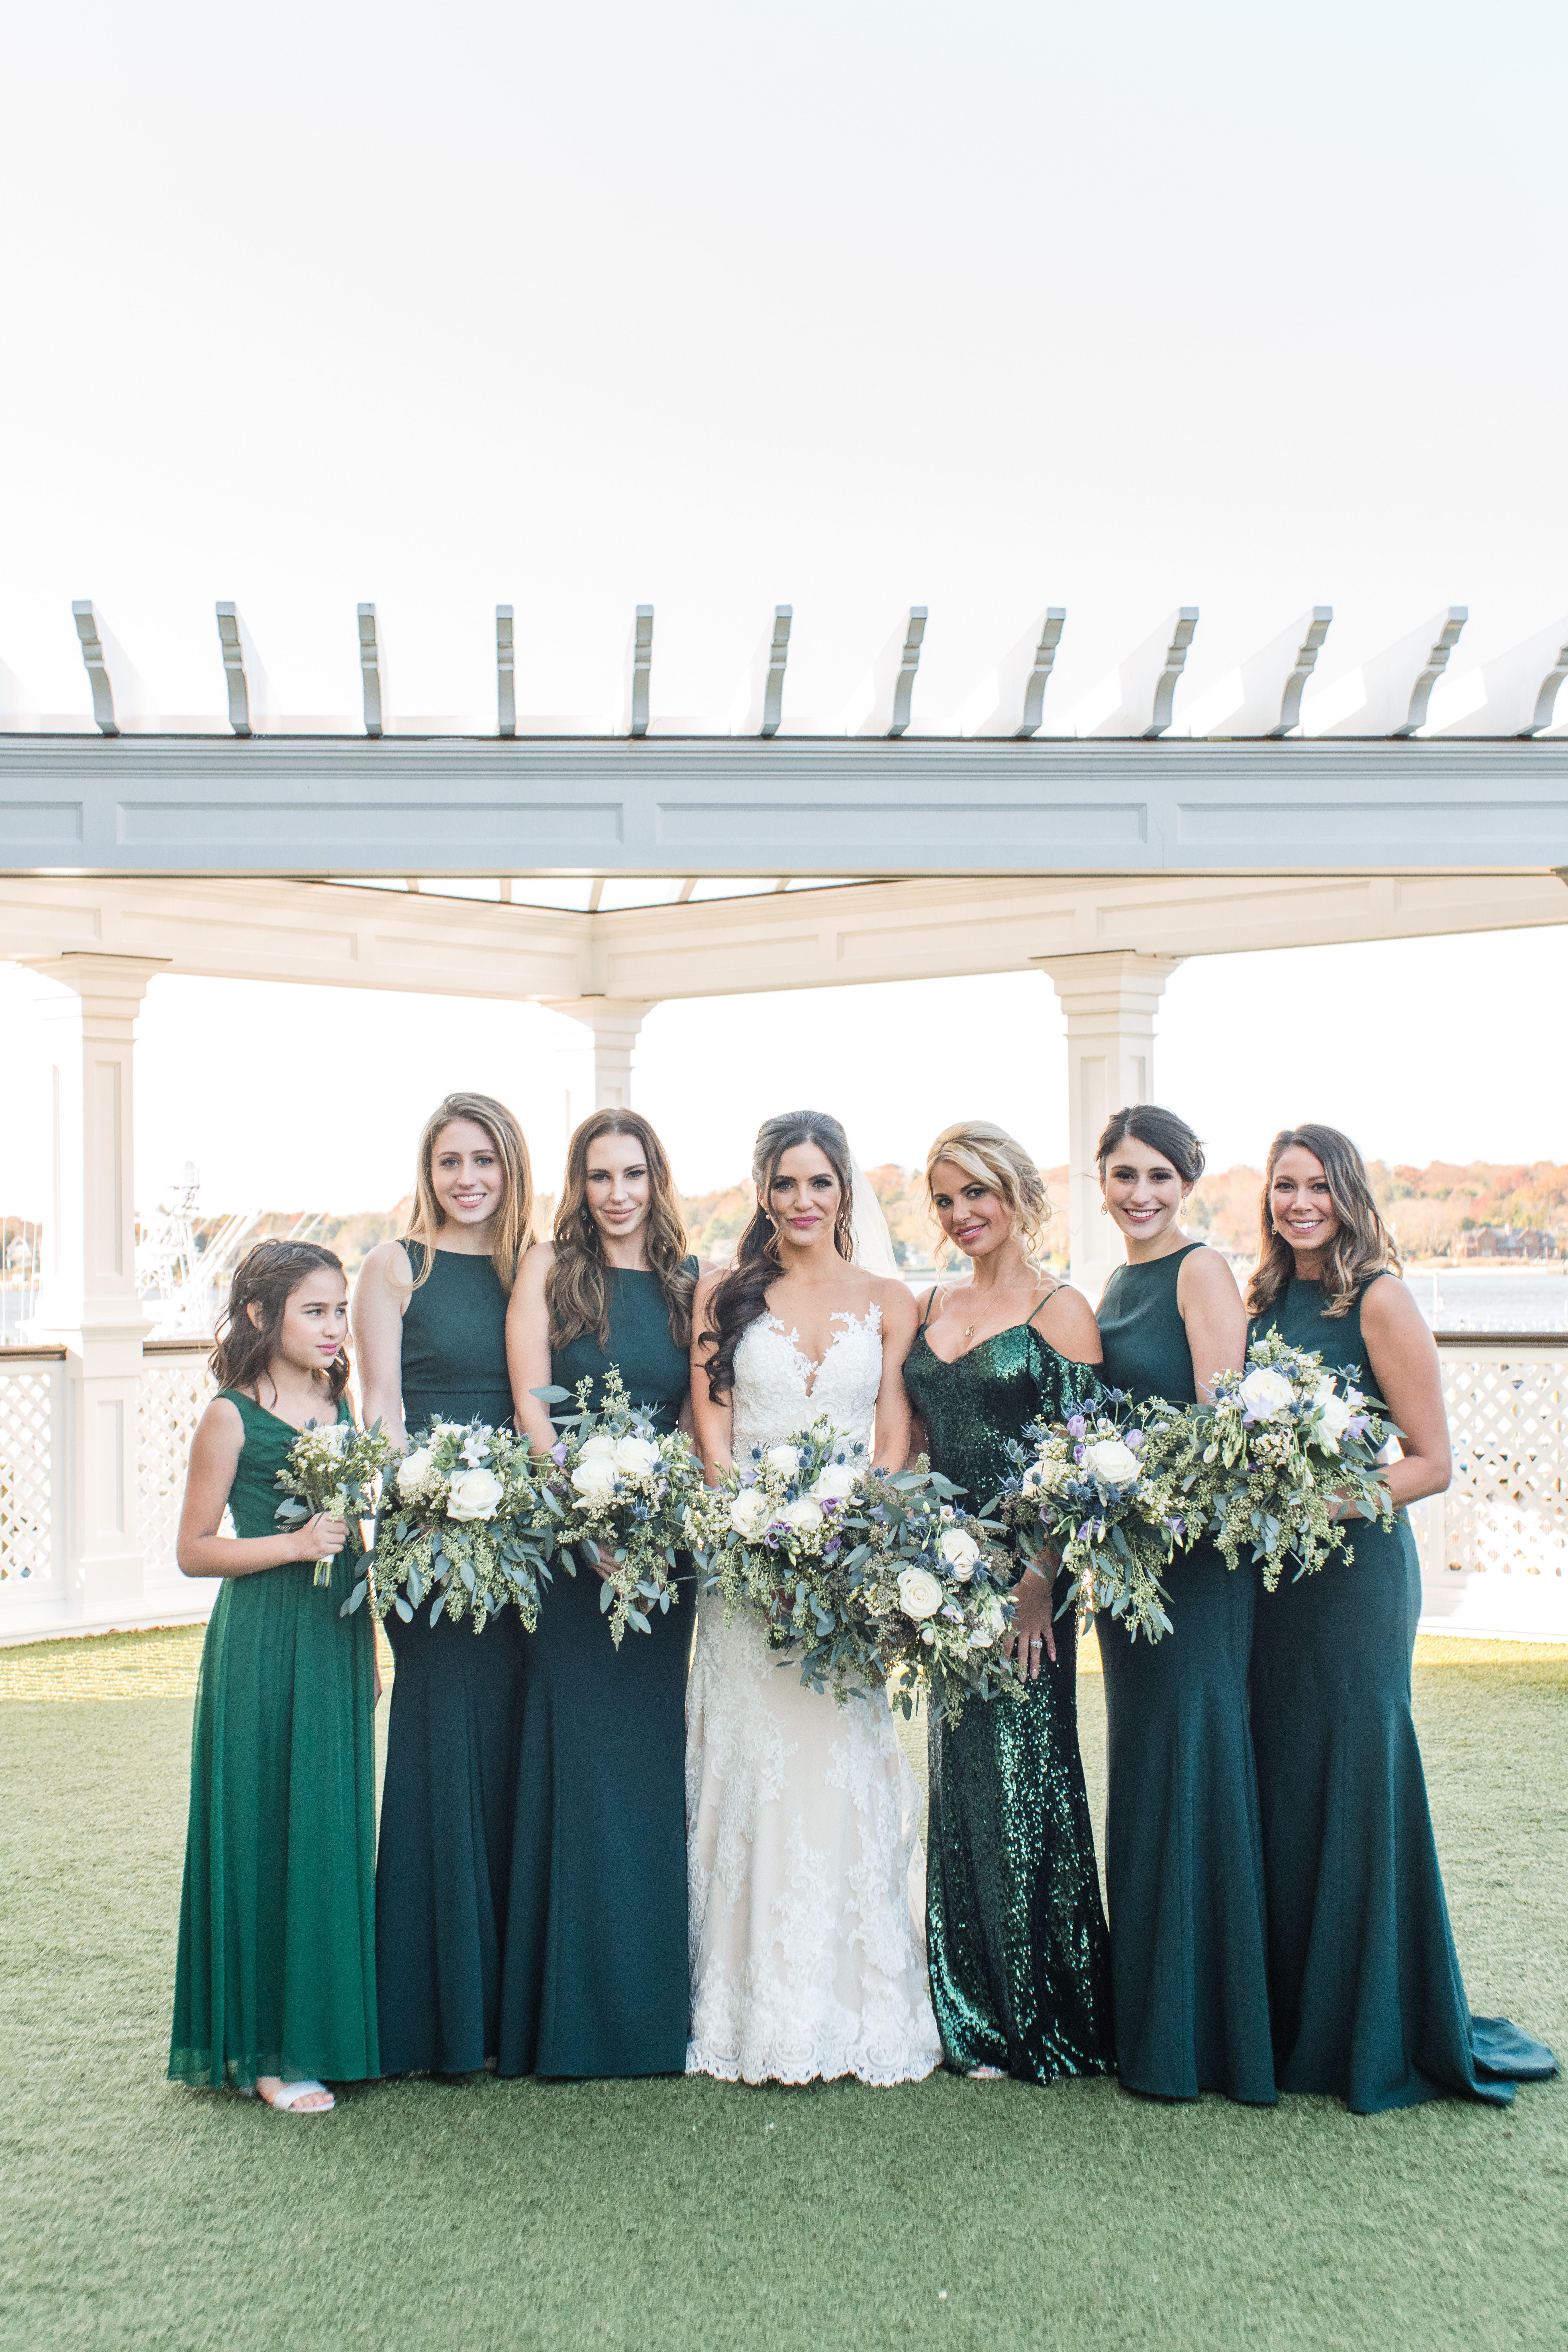 Bridesmaid Dresses In Nj - Ficts